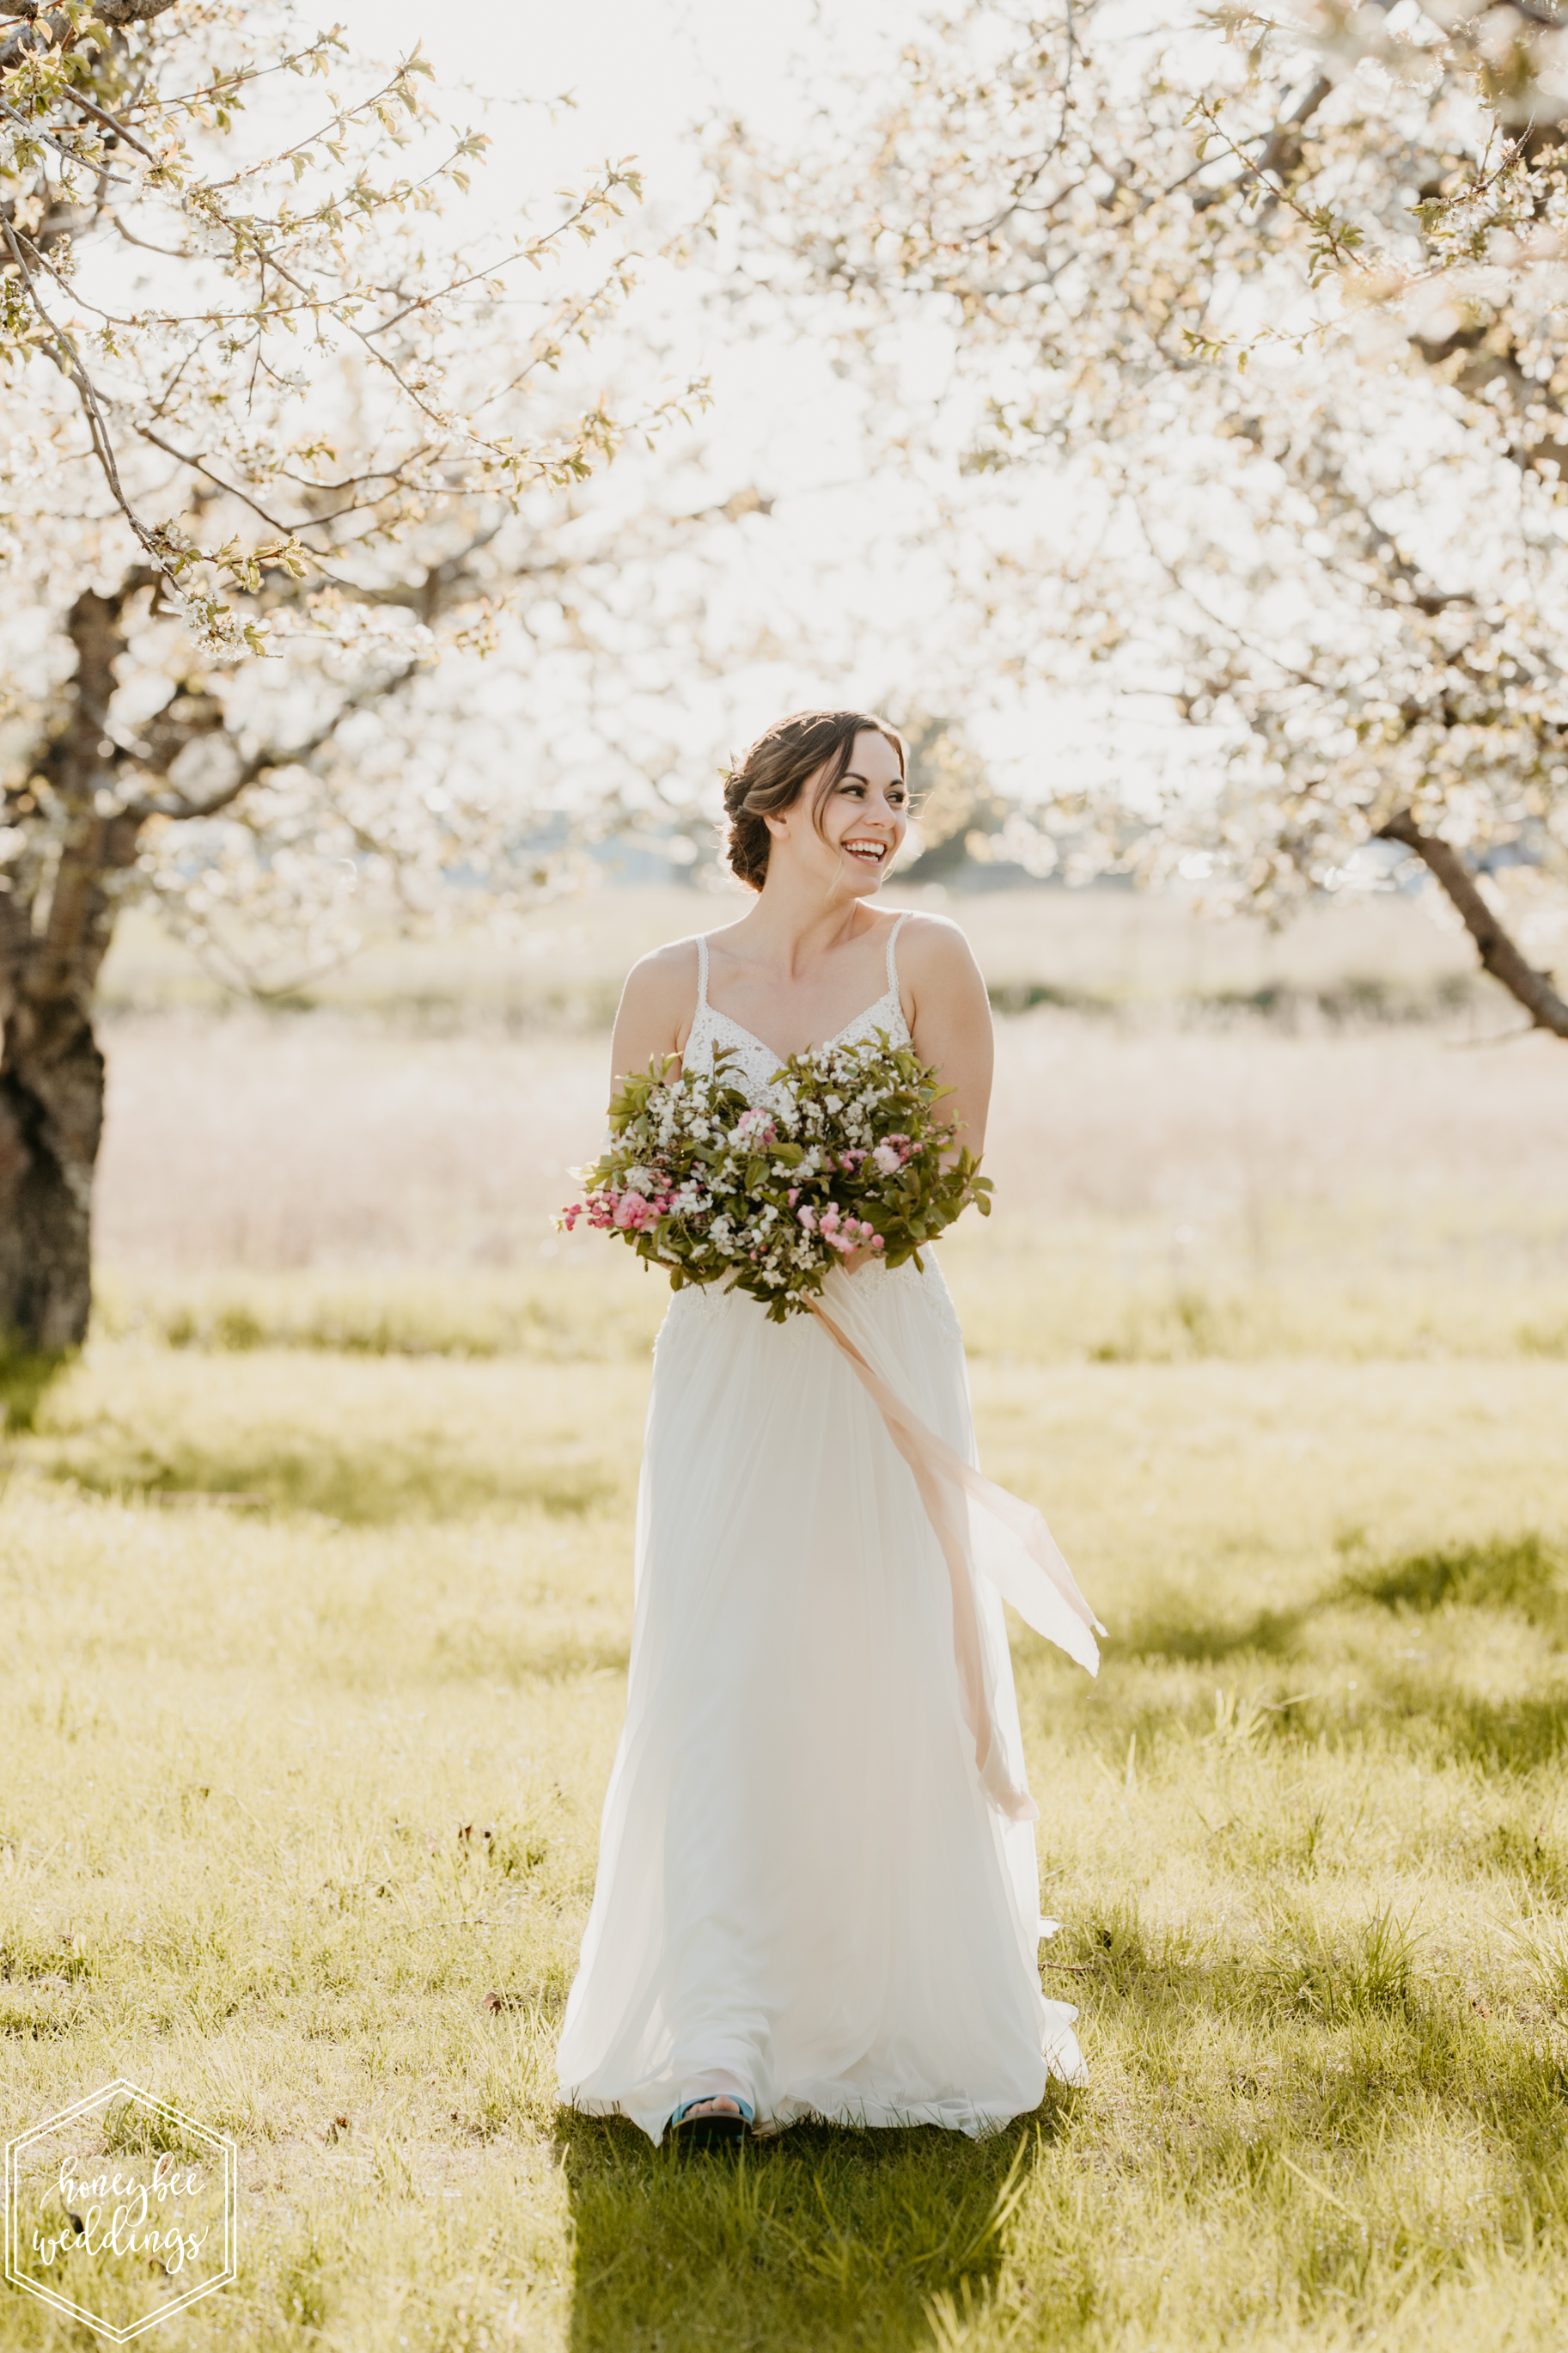 025Cherry Blossom Wedding_Styled Photoshoot_Honeybee Weddings_May 11, 2019-330.jpg